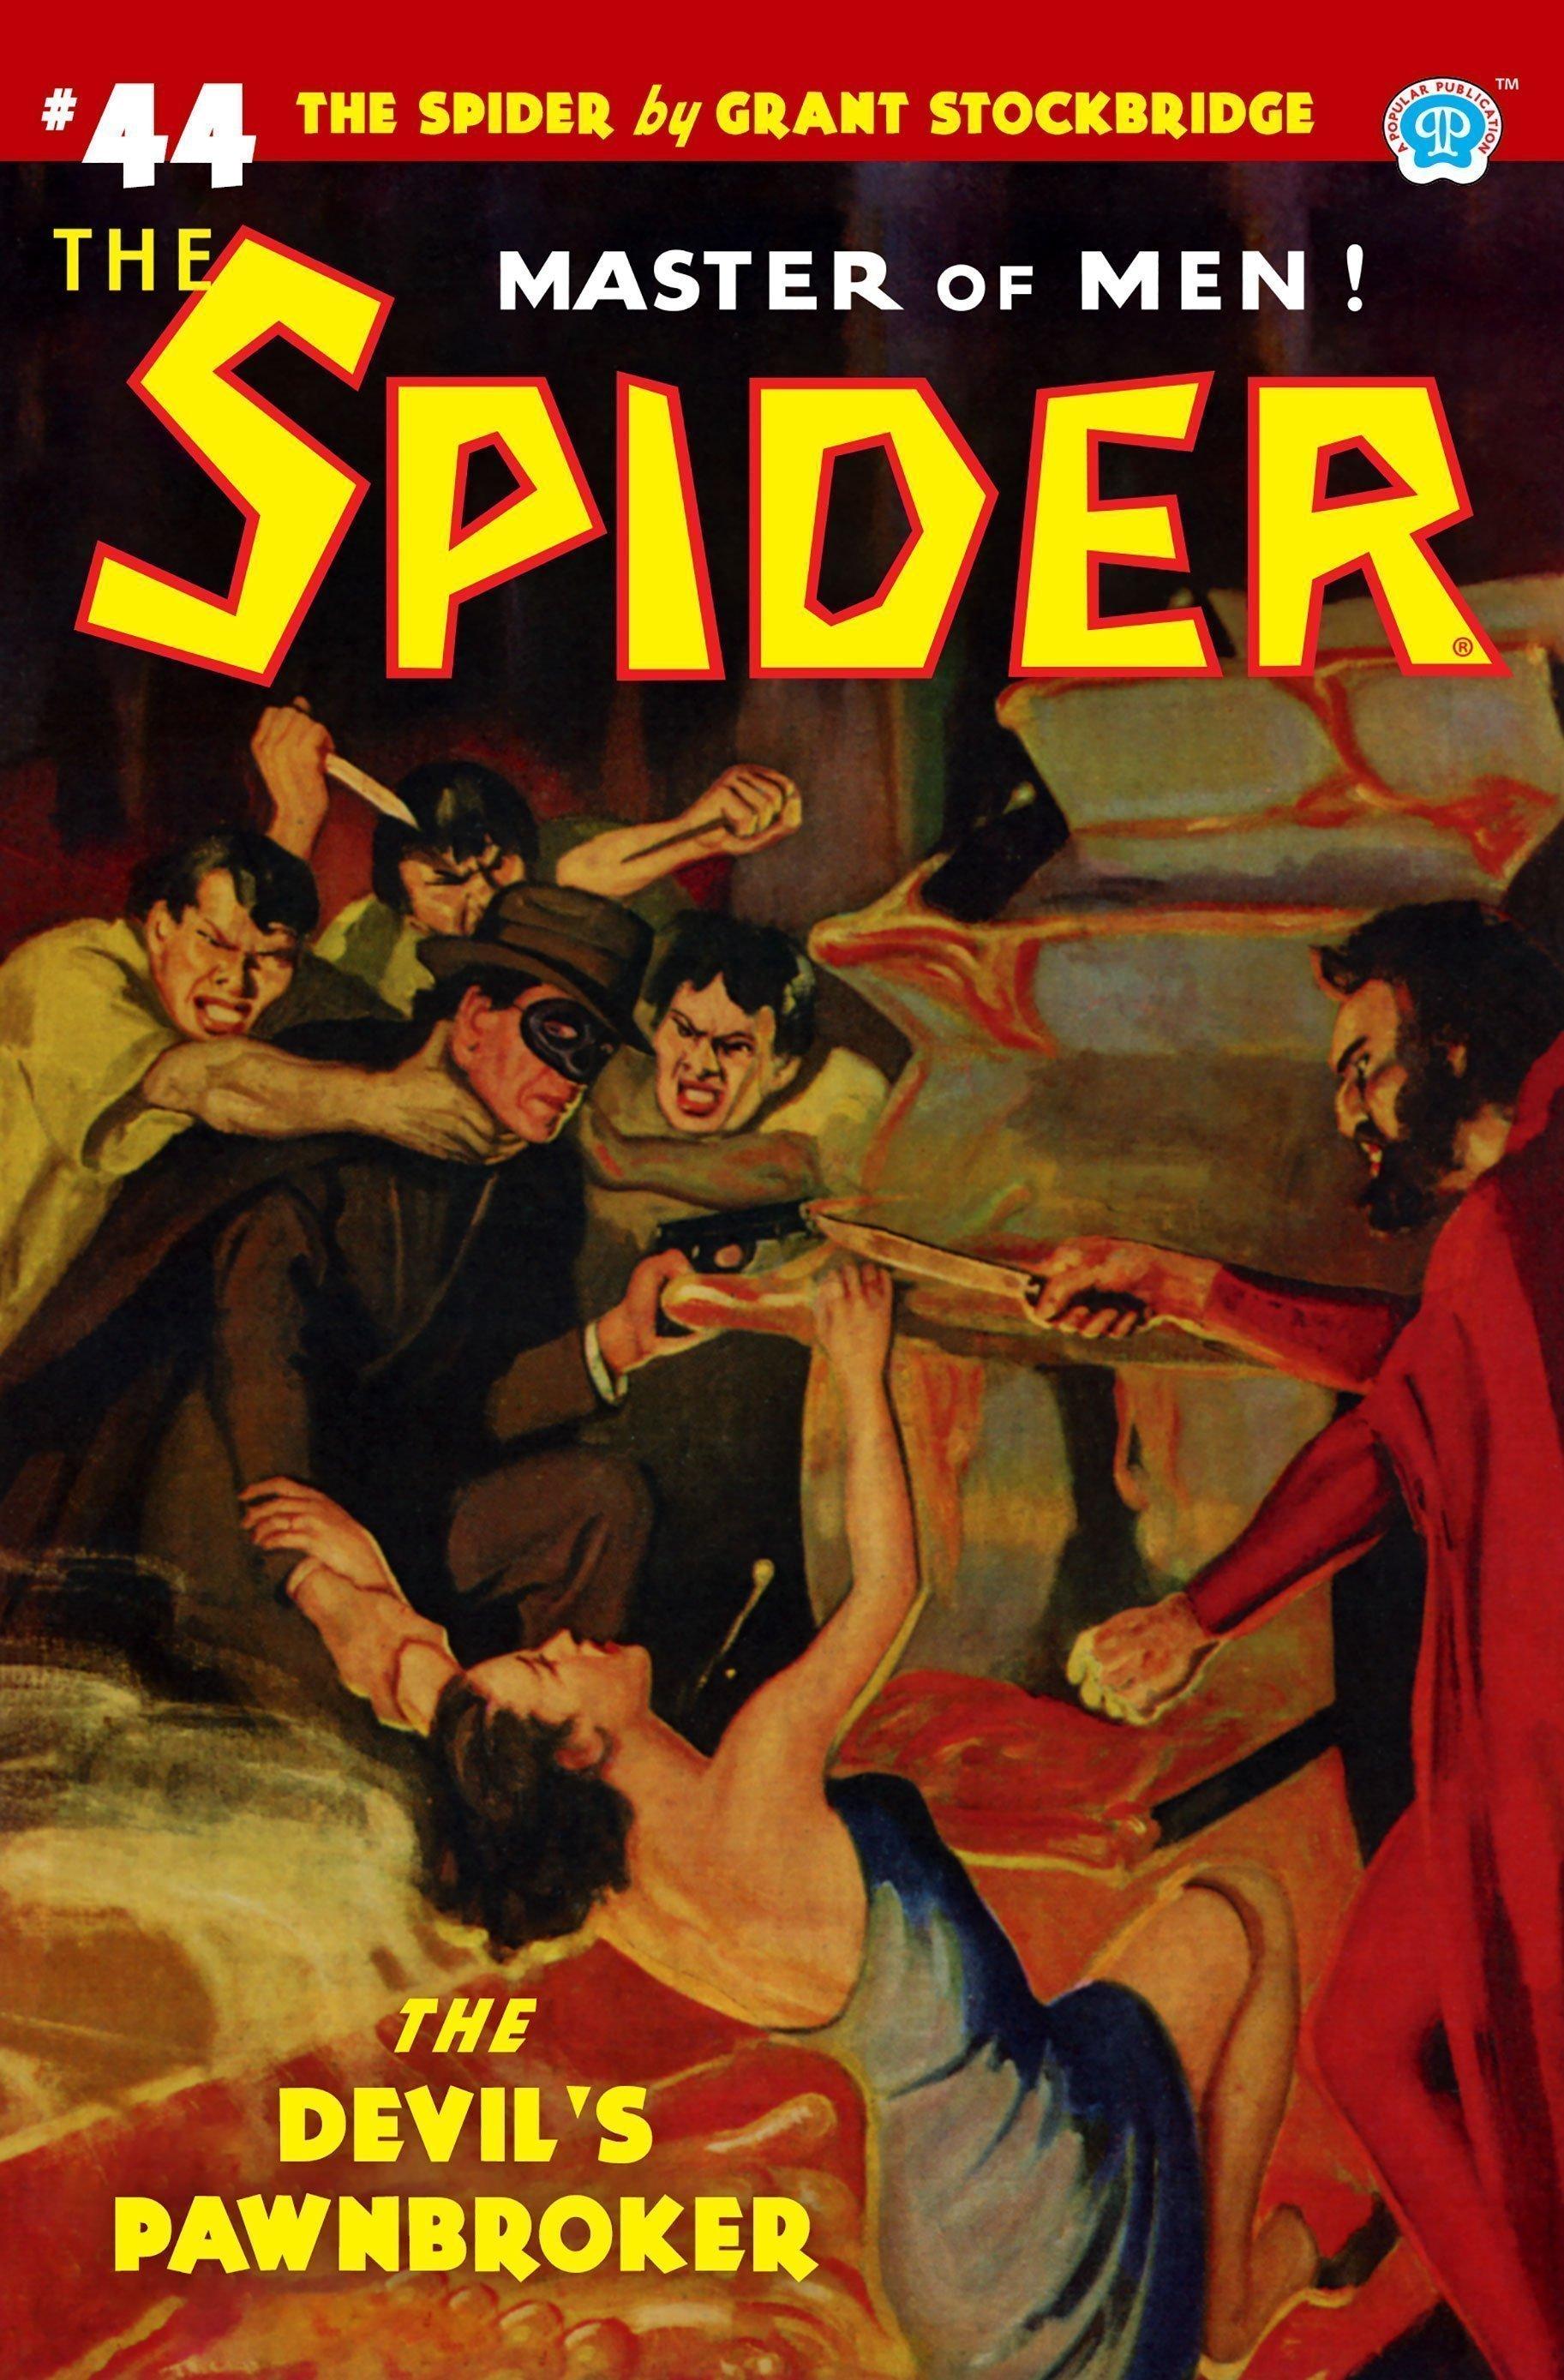 The Spider #44: The Devil's Pawnbroker